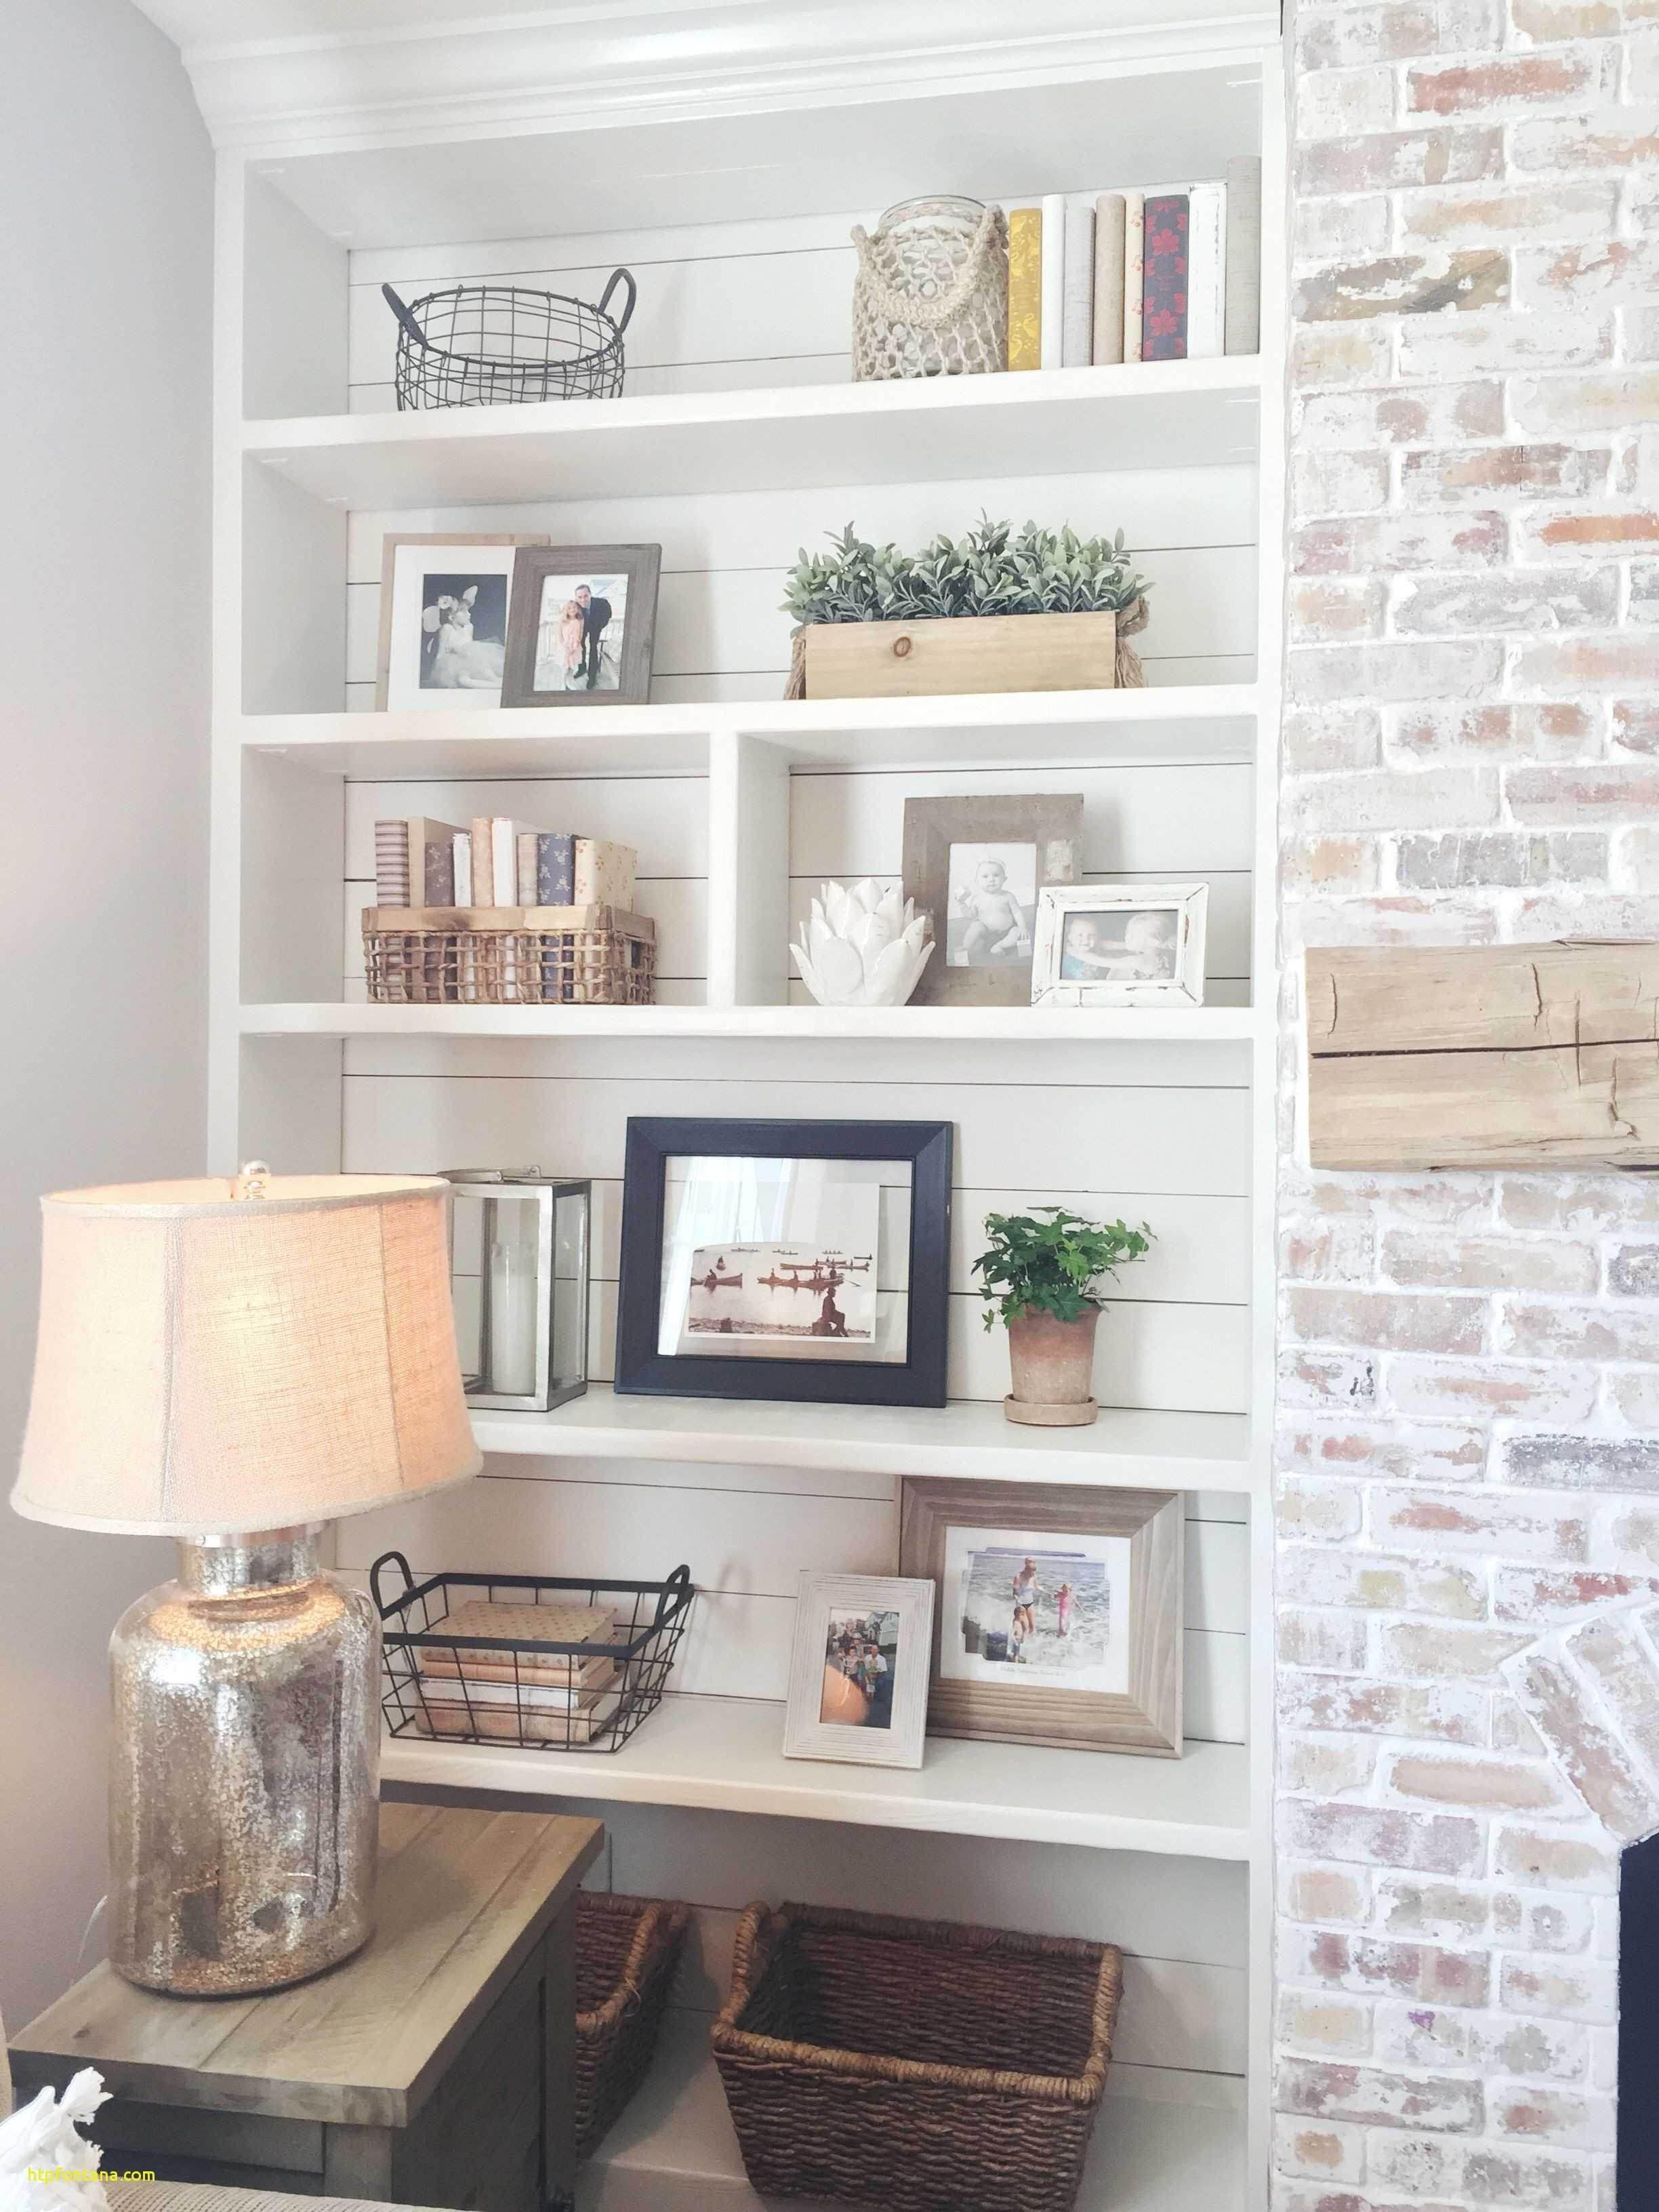 Fire Place Decorating Ideas Living Room Shelves Farm House Living Room Home